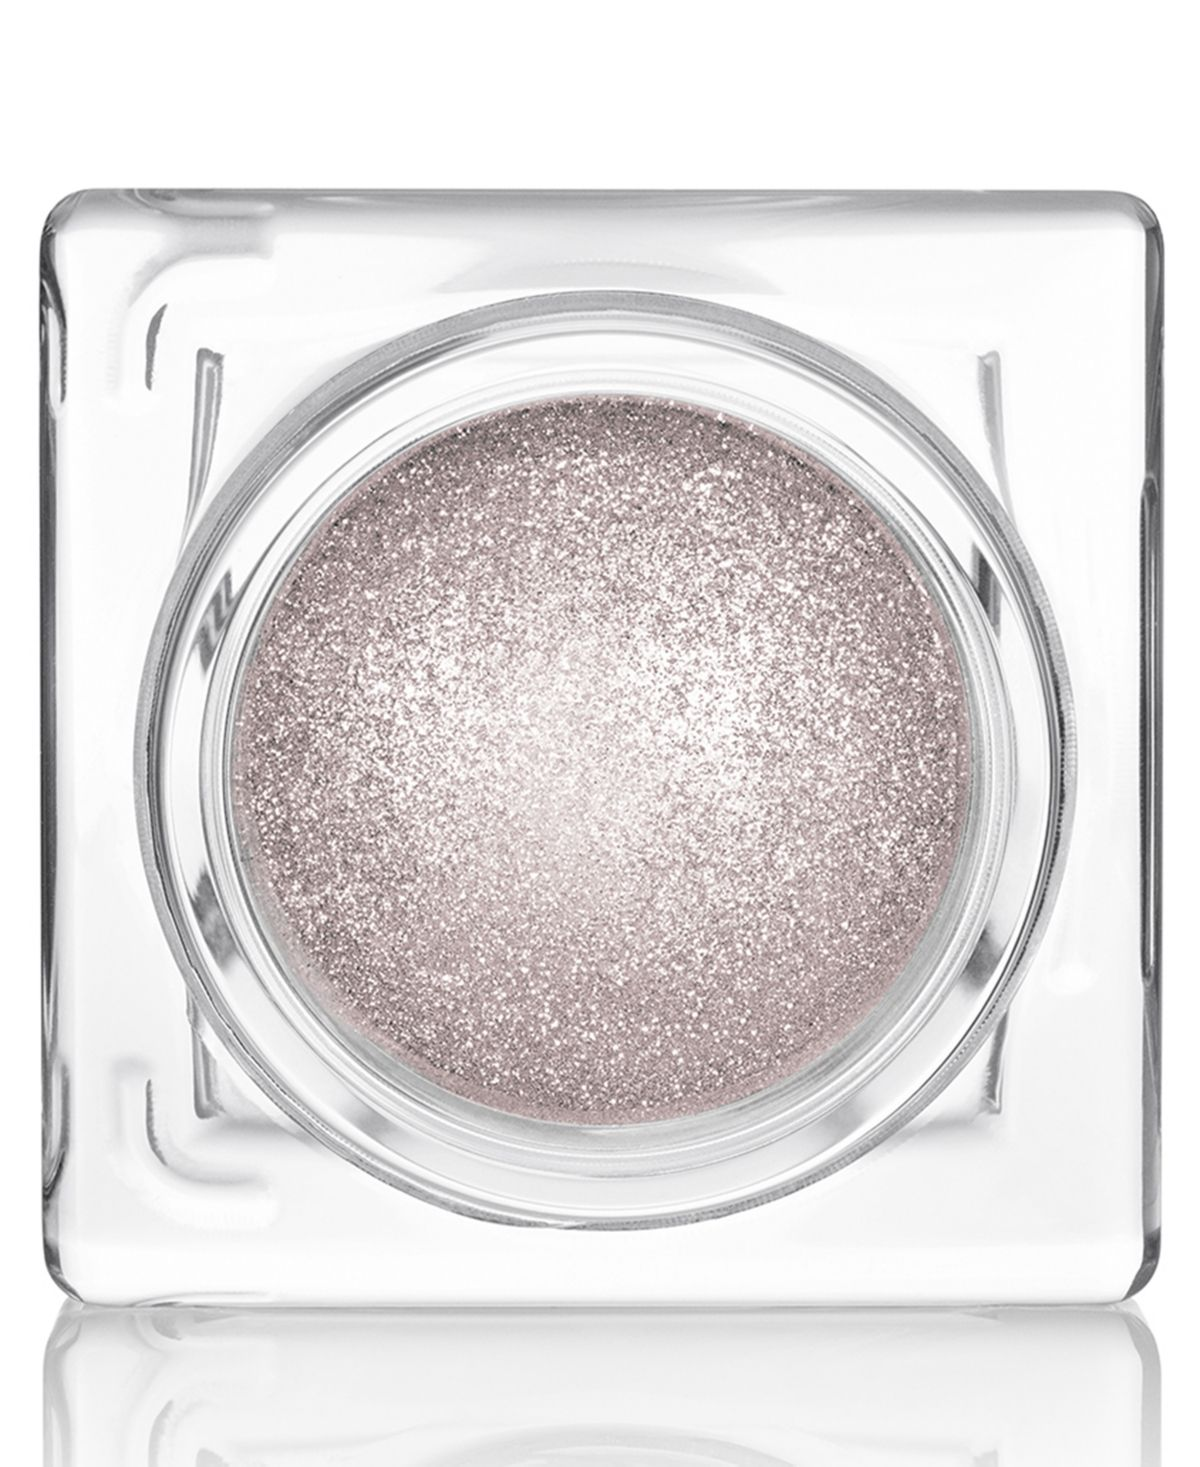 Shiseido Aura Dew, 0.24oz. & Reviews Makeup Beauty